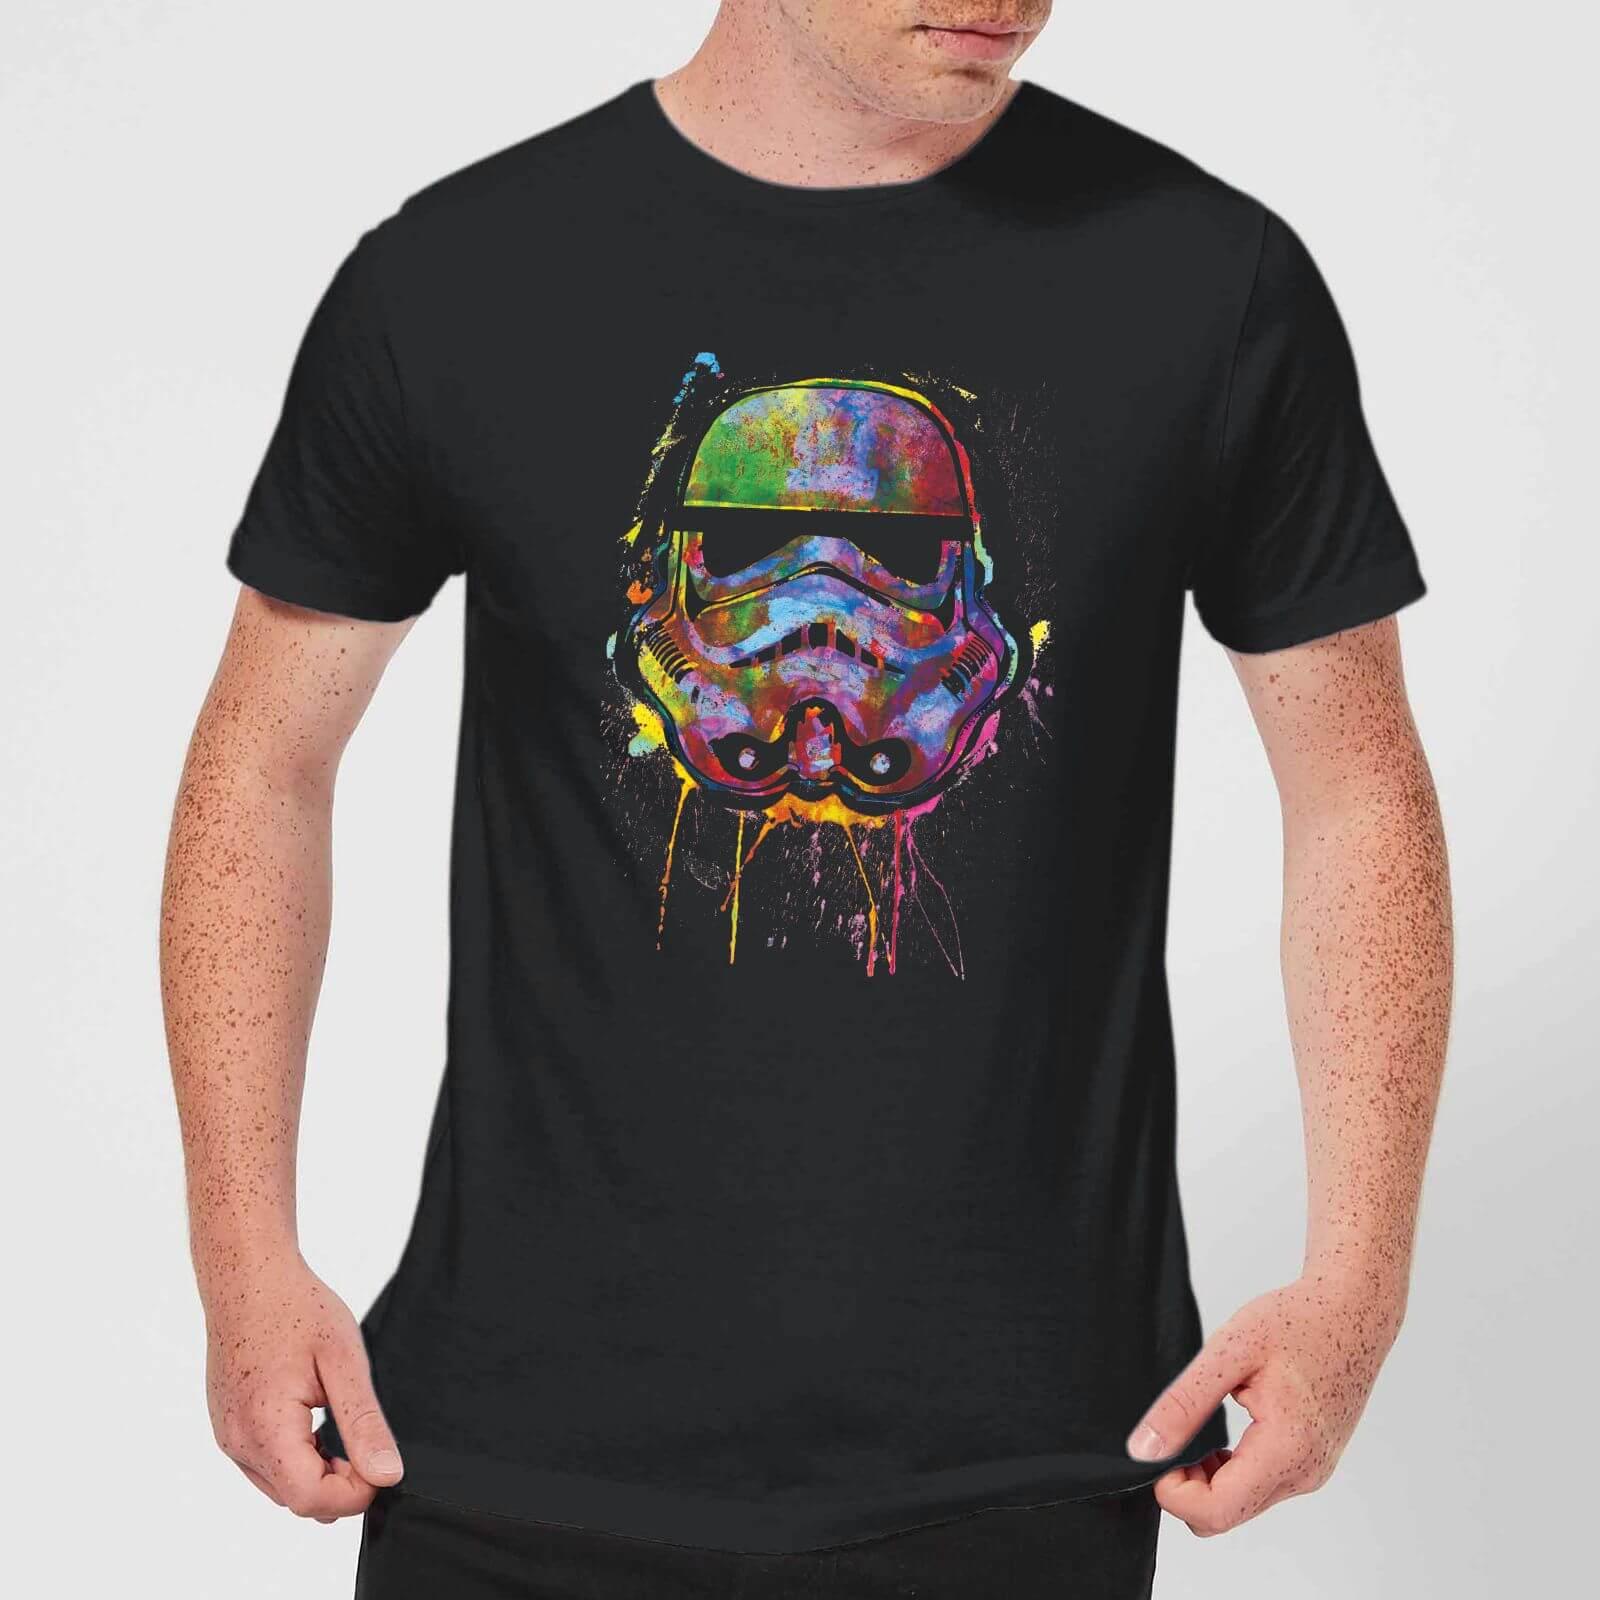 Star Wars Paint Splat Stormtrooper (Men's or Women's) T-Shirt - Black - £8.99 delivered (With Code) at Zavvi